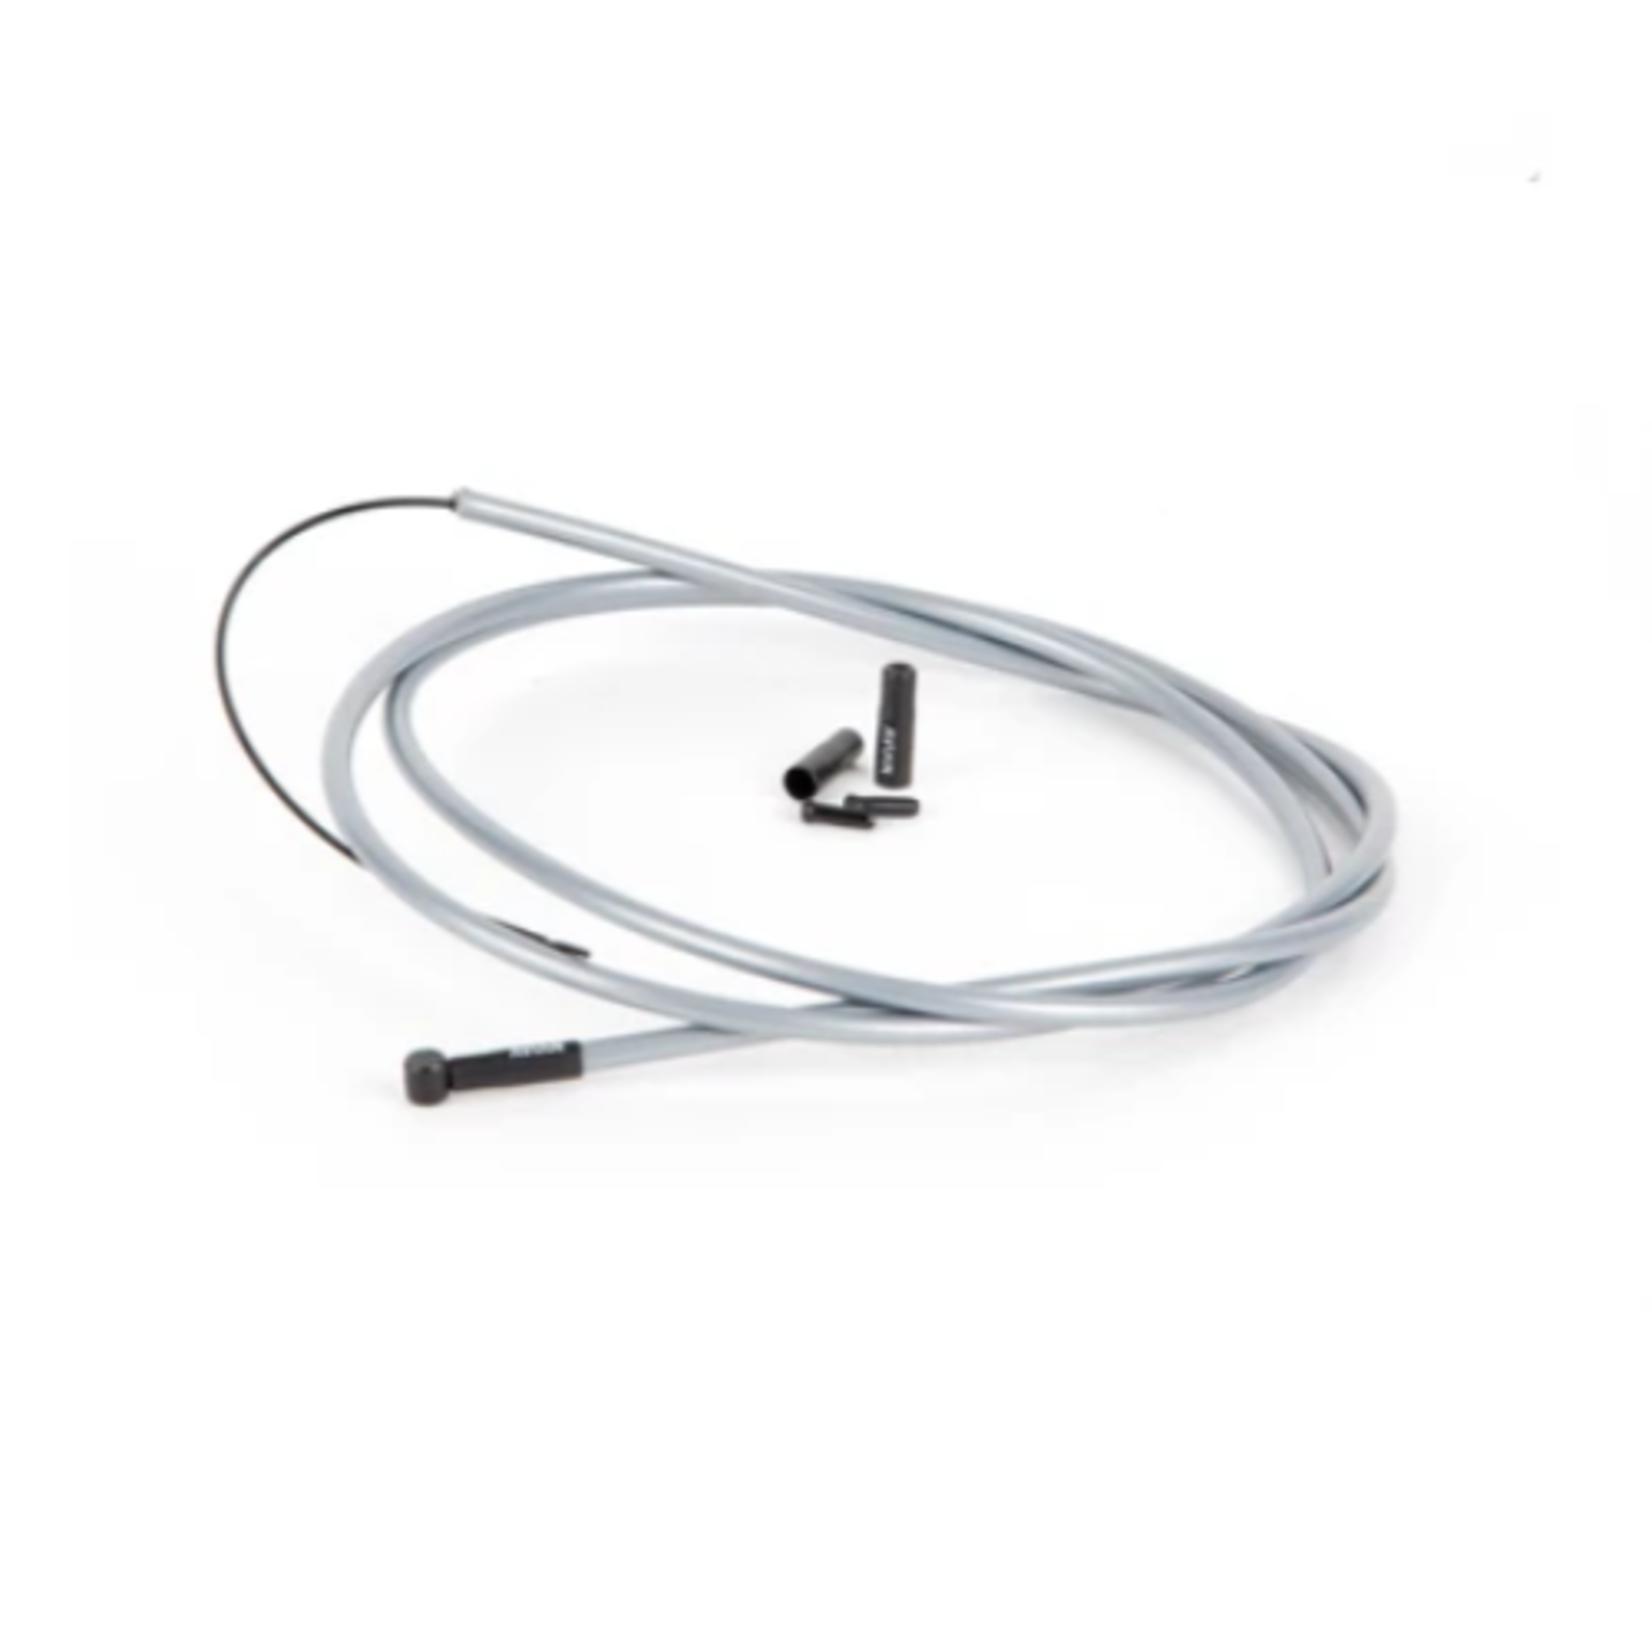 Avian Avian Linear Brake Cable